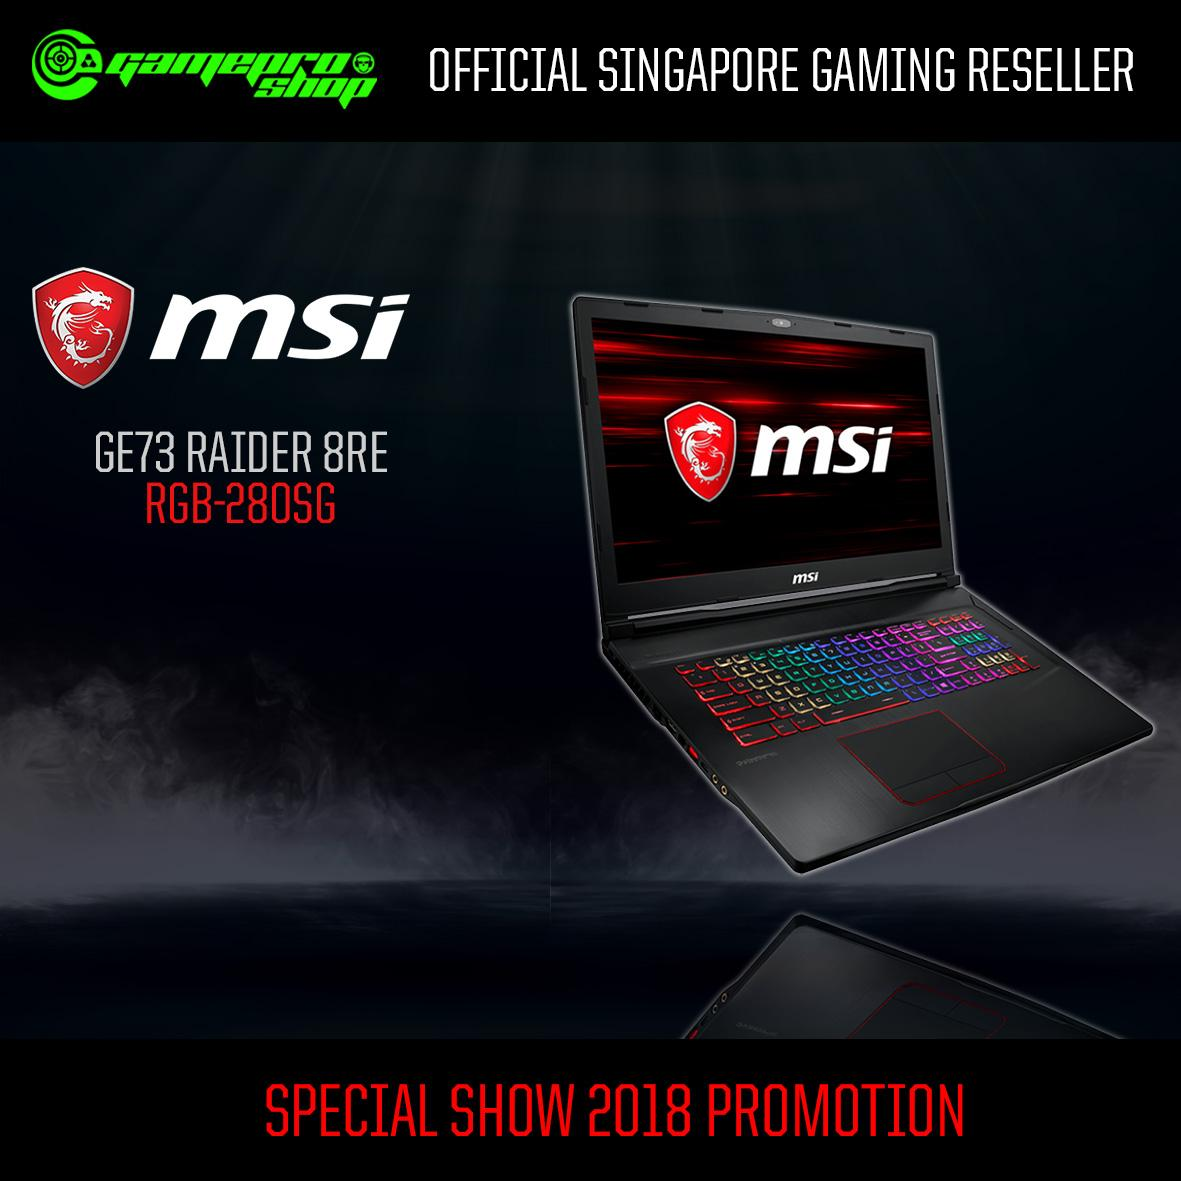 MSI GE73 Raider 8RE RGB-280SG (I7-8750H/16GB DDR4/256GB SSD+1TB HDD 7200RPM/6GB NVIDIA GTX1060 GDDR5/17.3FHD 120Hz/W10)